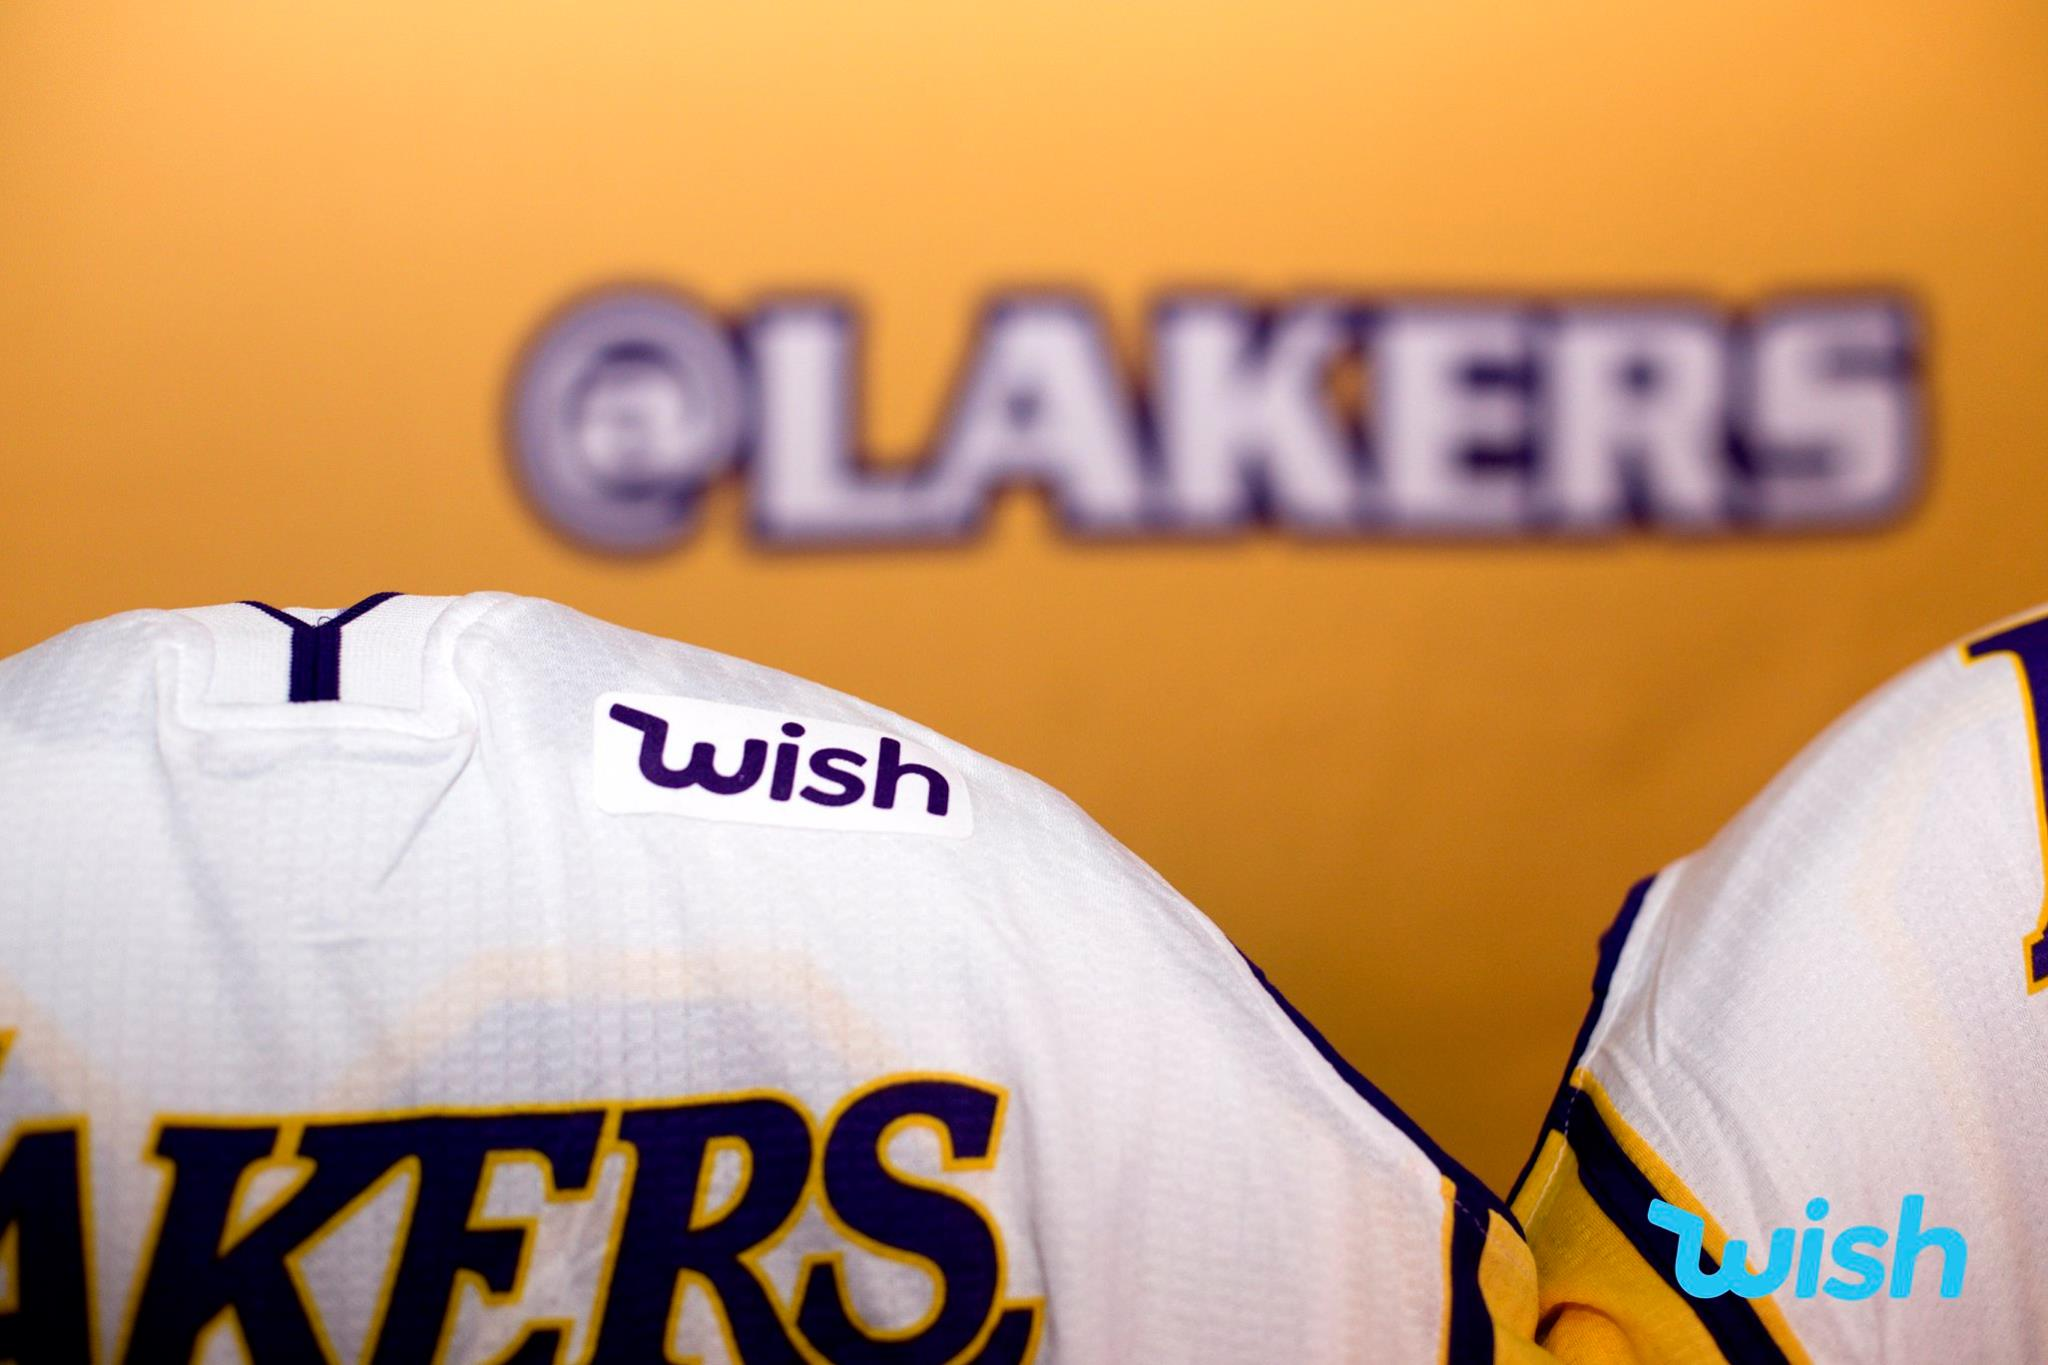 Lakers and Wish stars